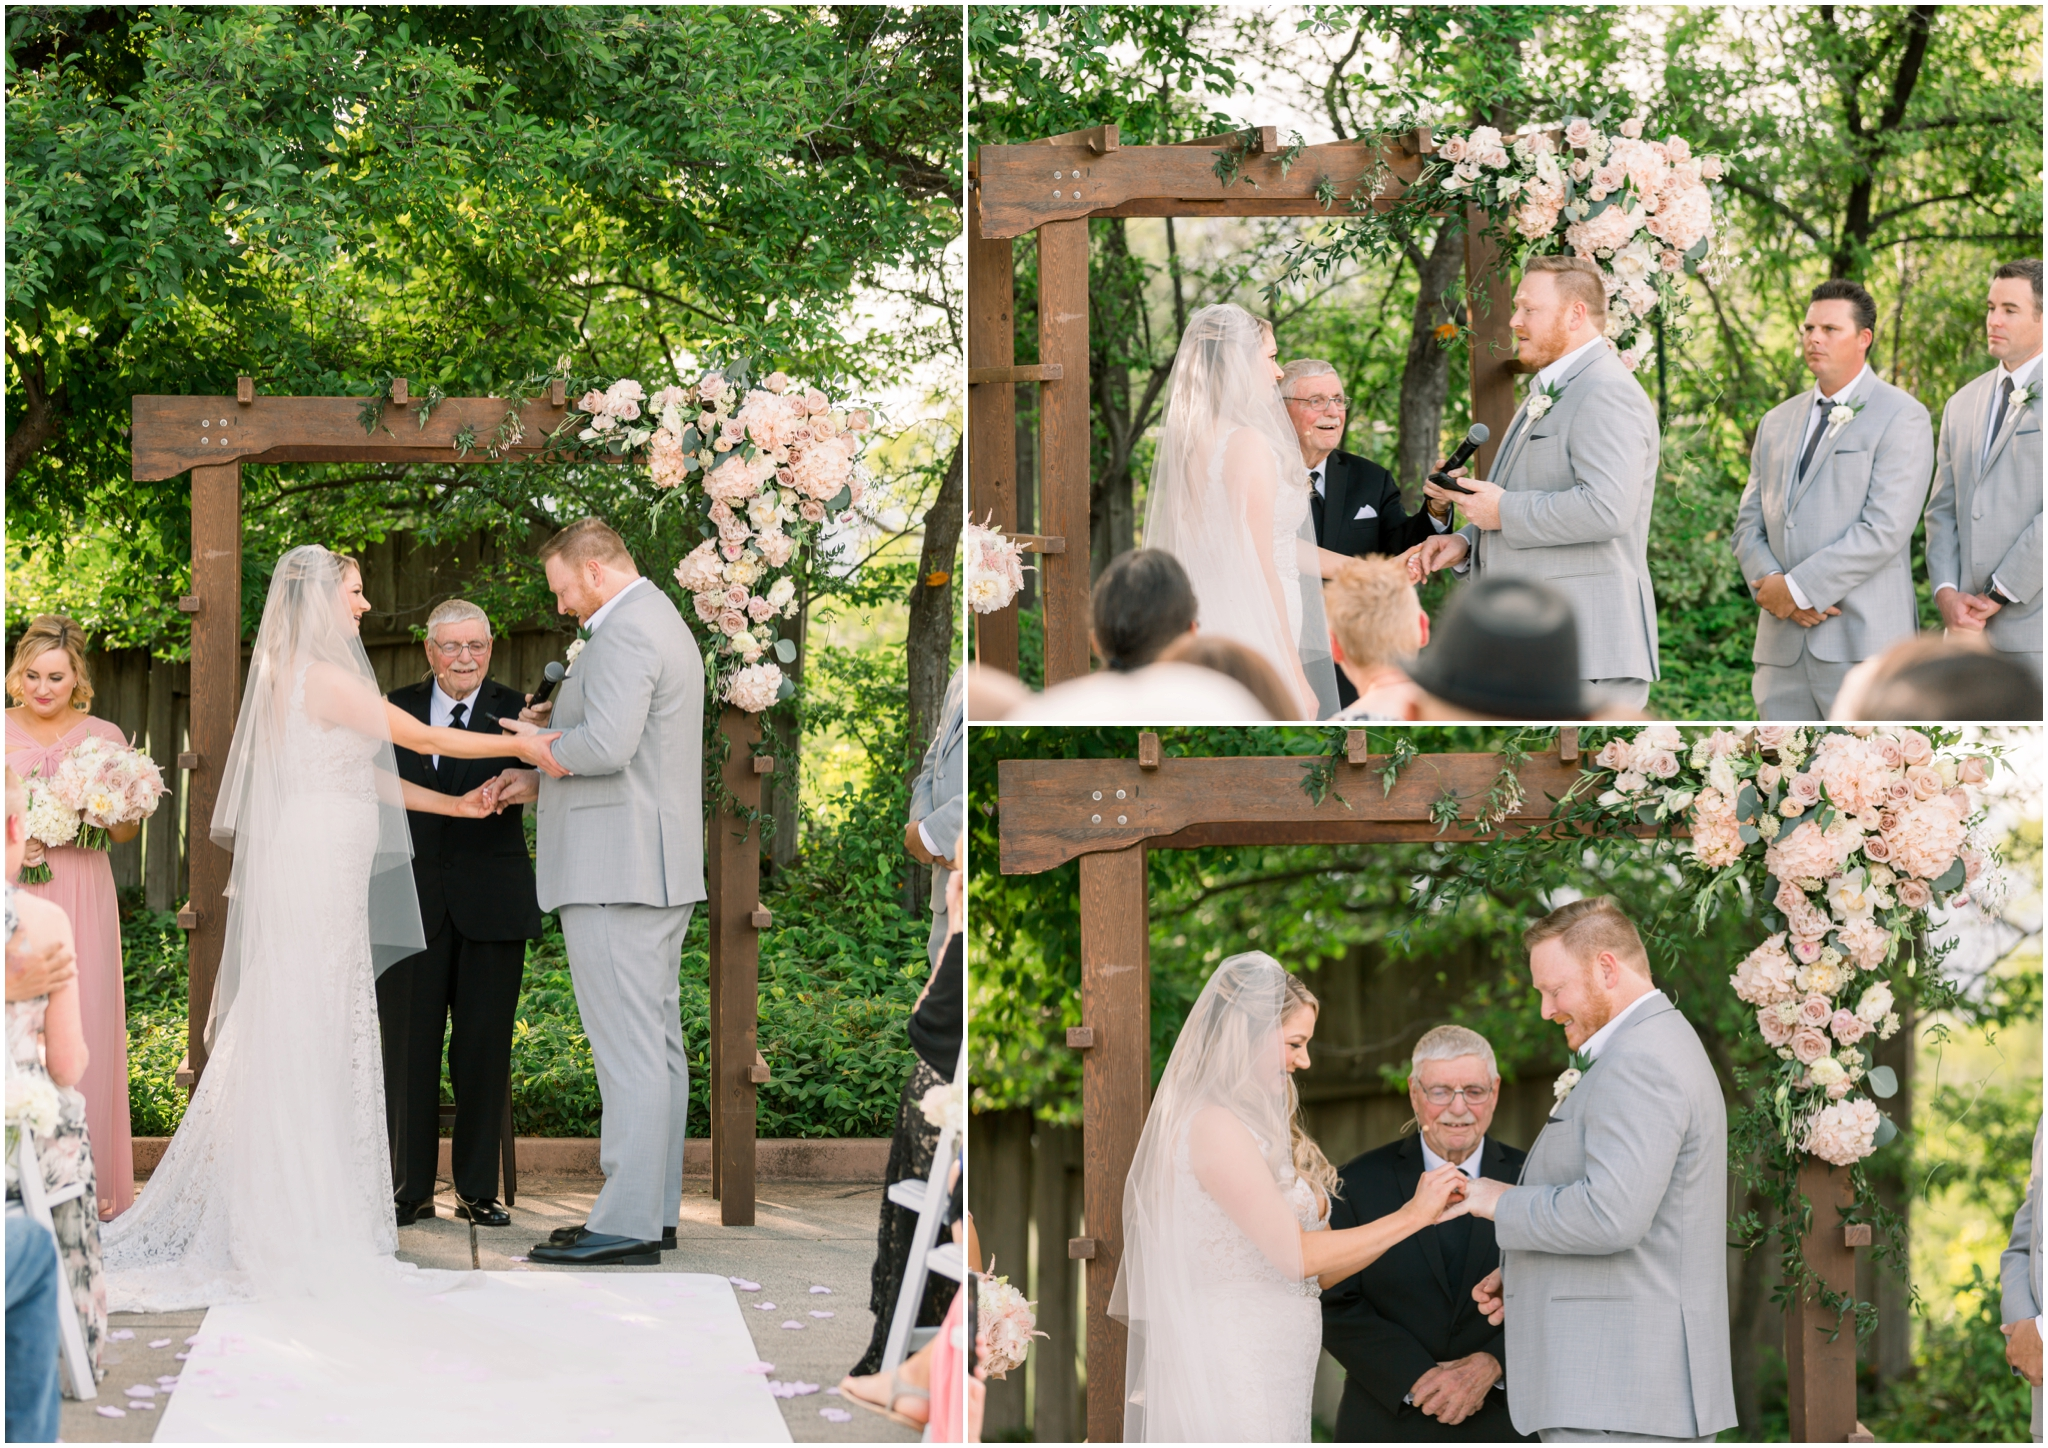 cindy_joseph_wedding_redding_blog_0023.jpg